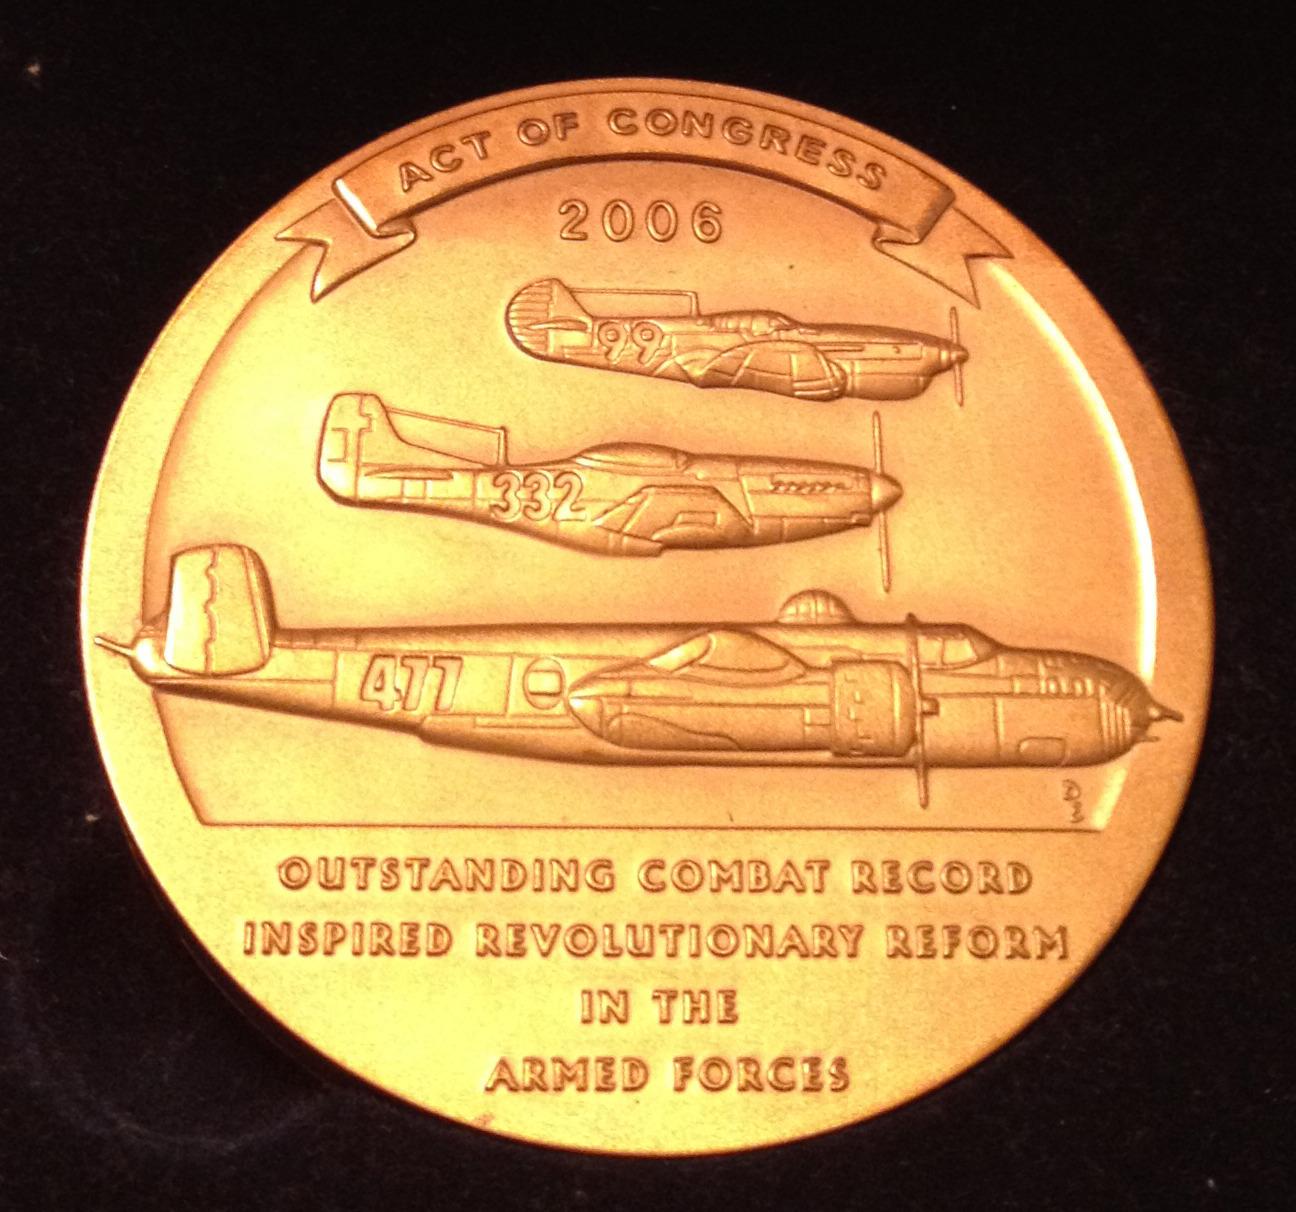 0c25b3d9074715049f8b_Congressional_Gold_Medal_back.jpg